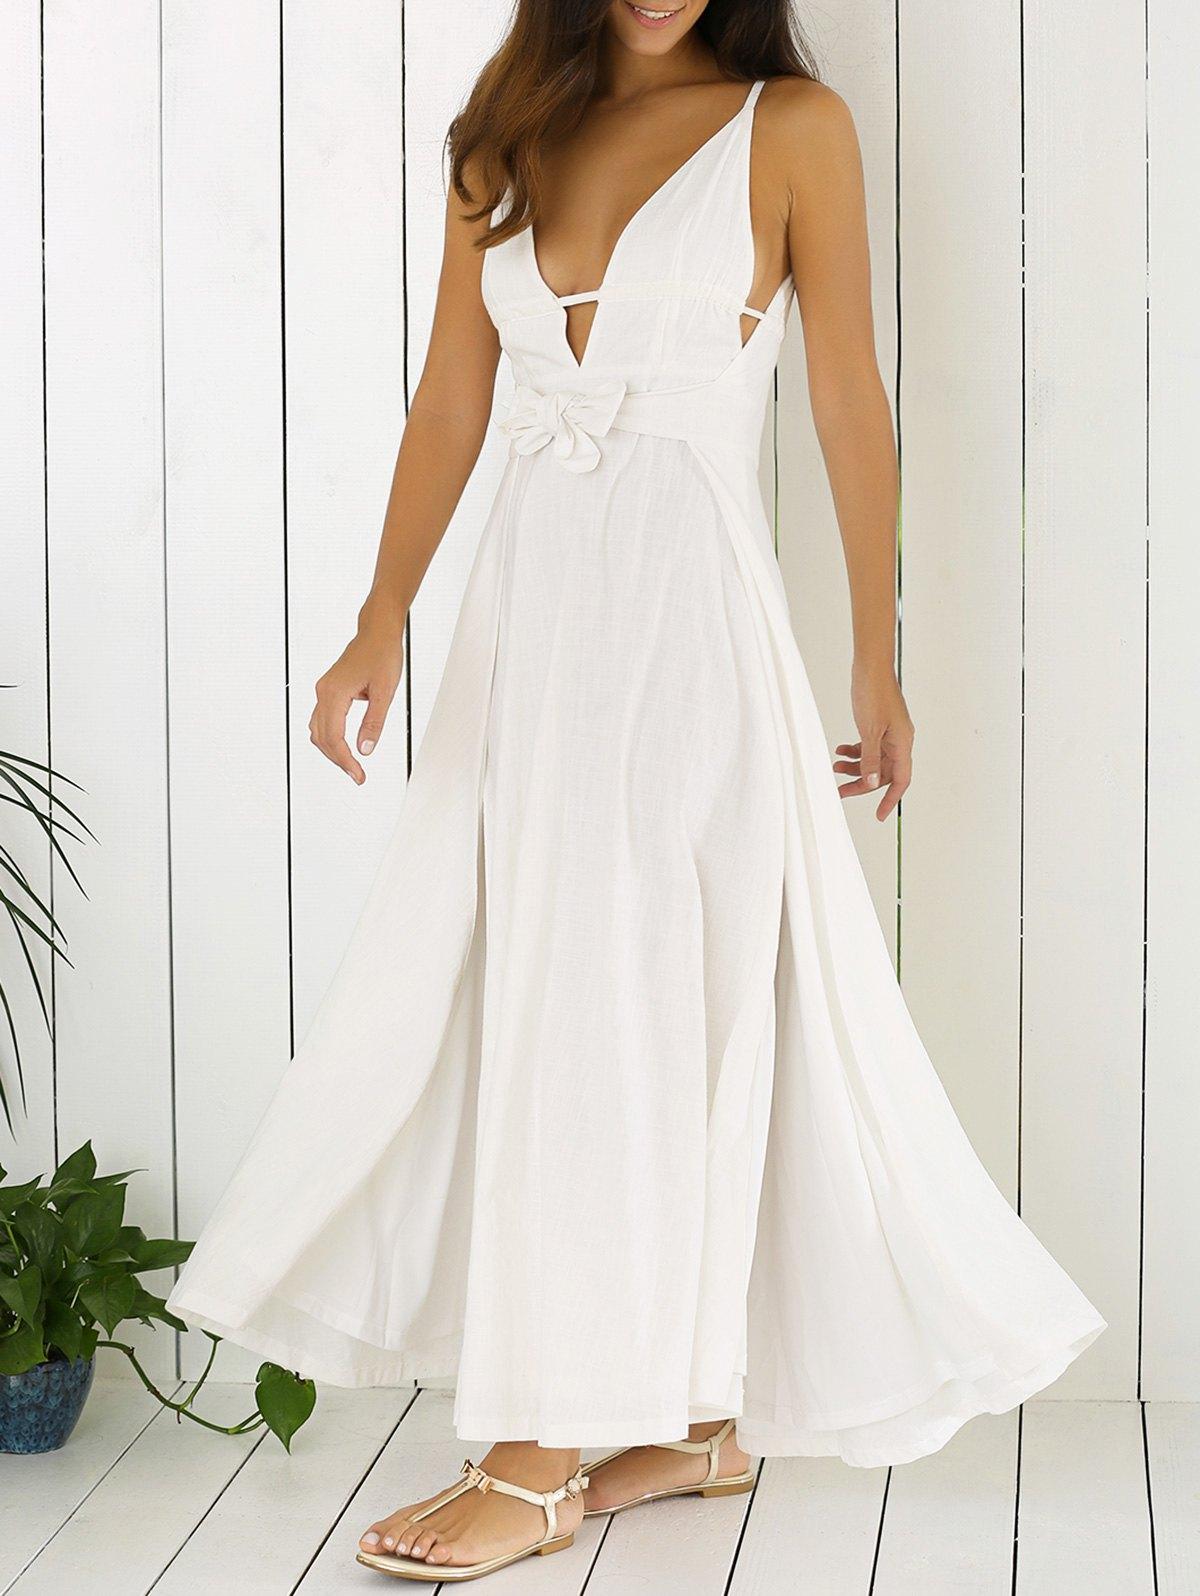 Cami Plunging Neck White Maxi Dress